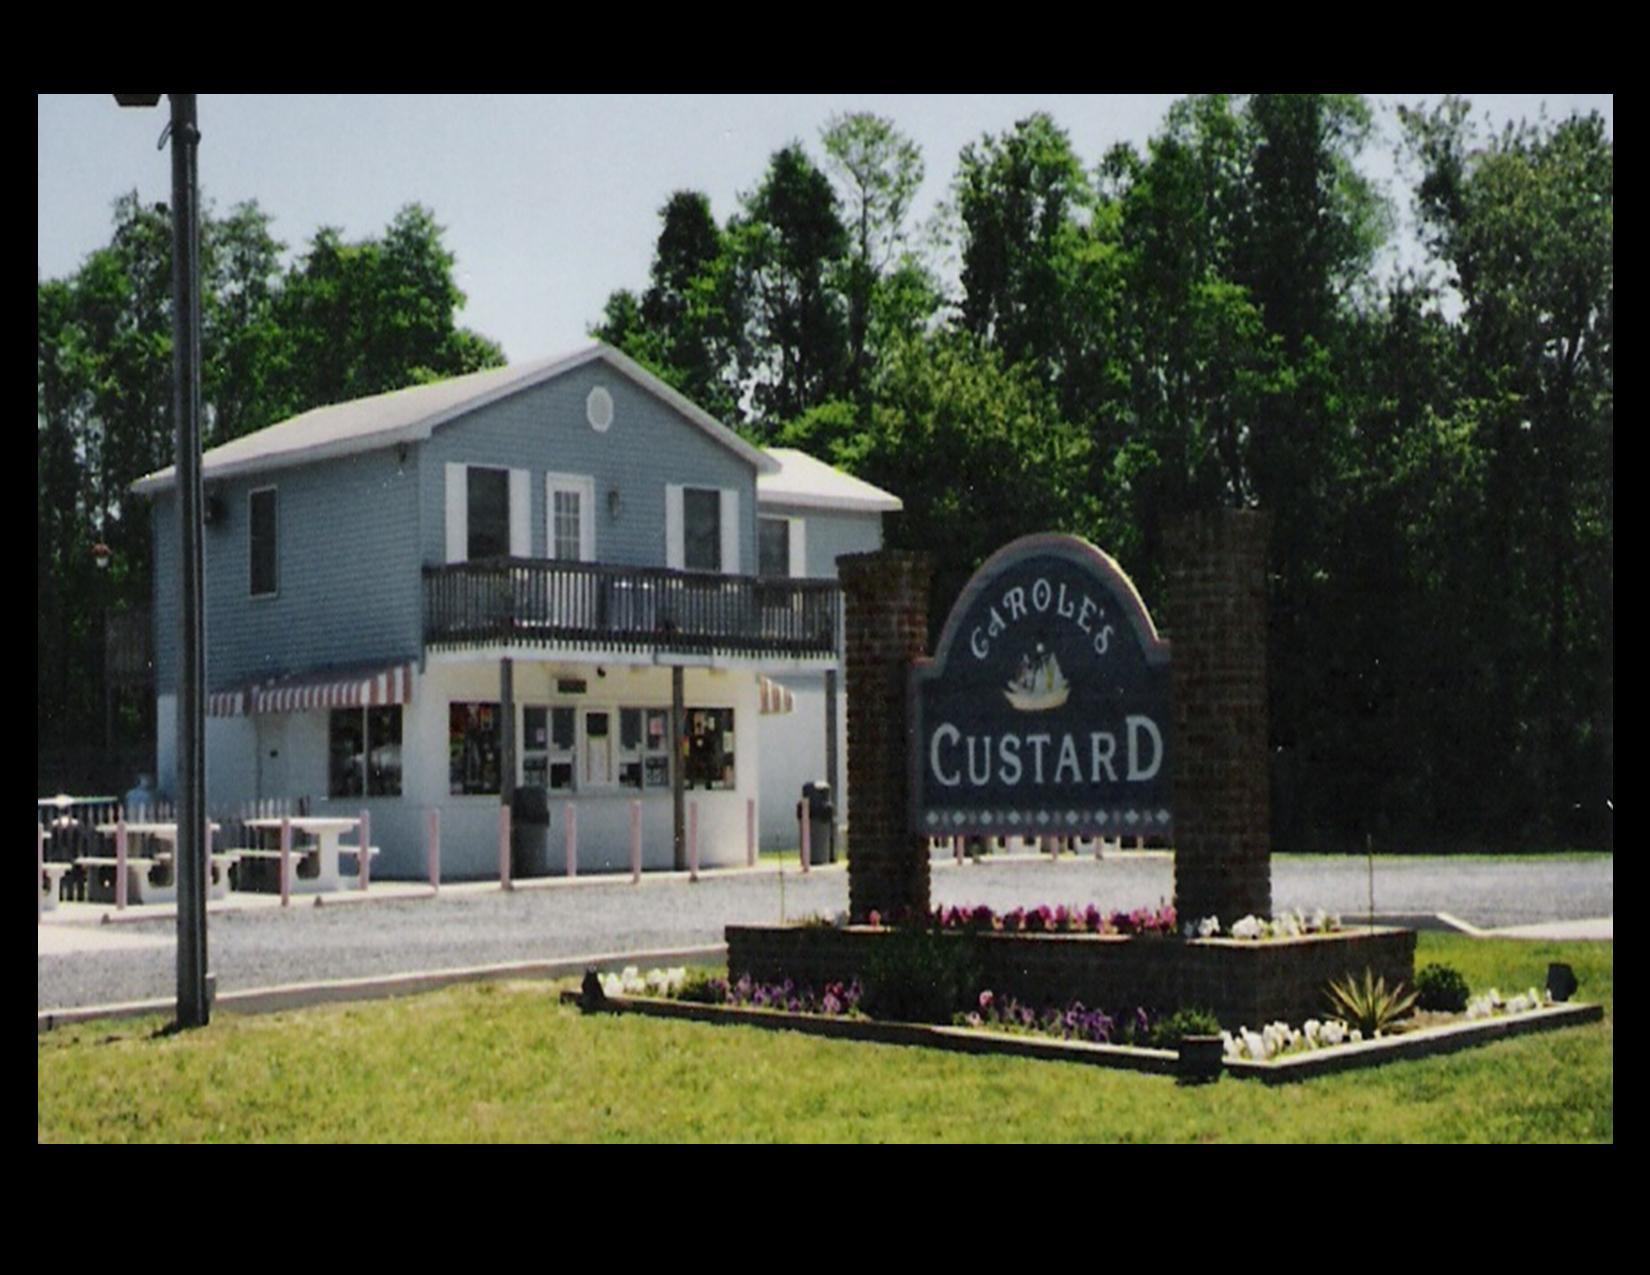 carol's custard